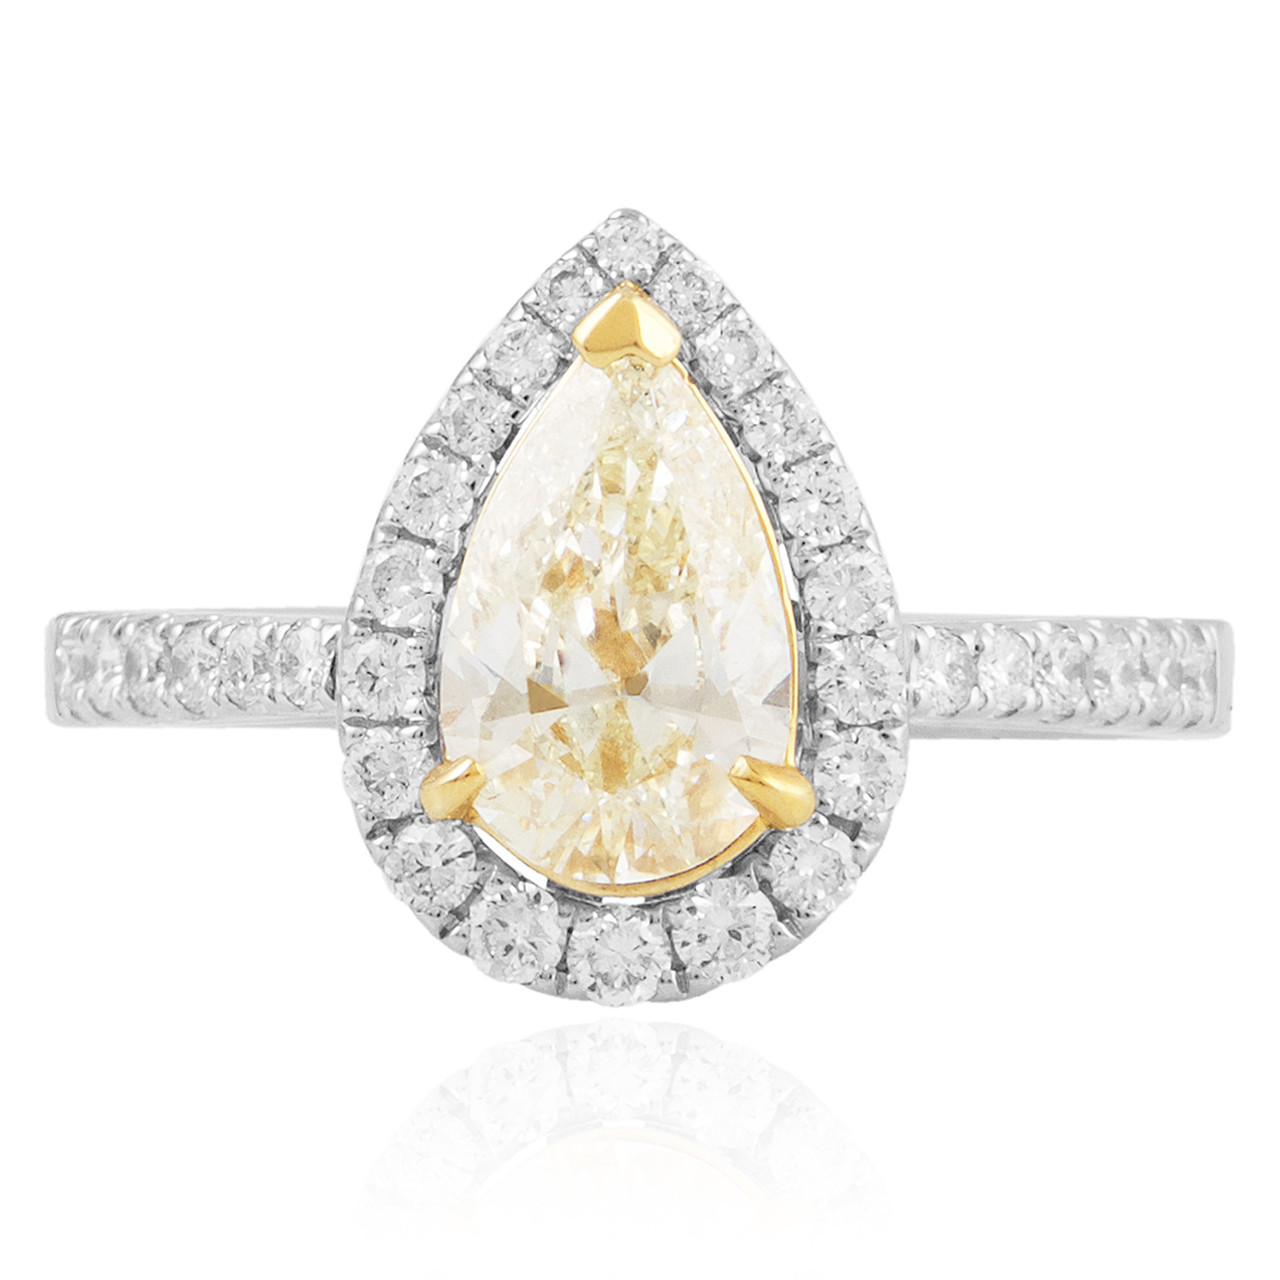 18K White Gold 1.45ct Pear Shape Canary Diamond Engagement ...